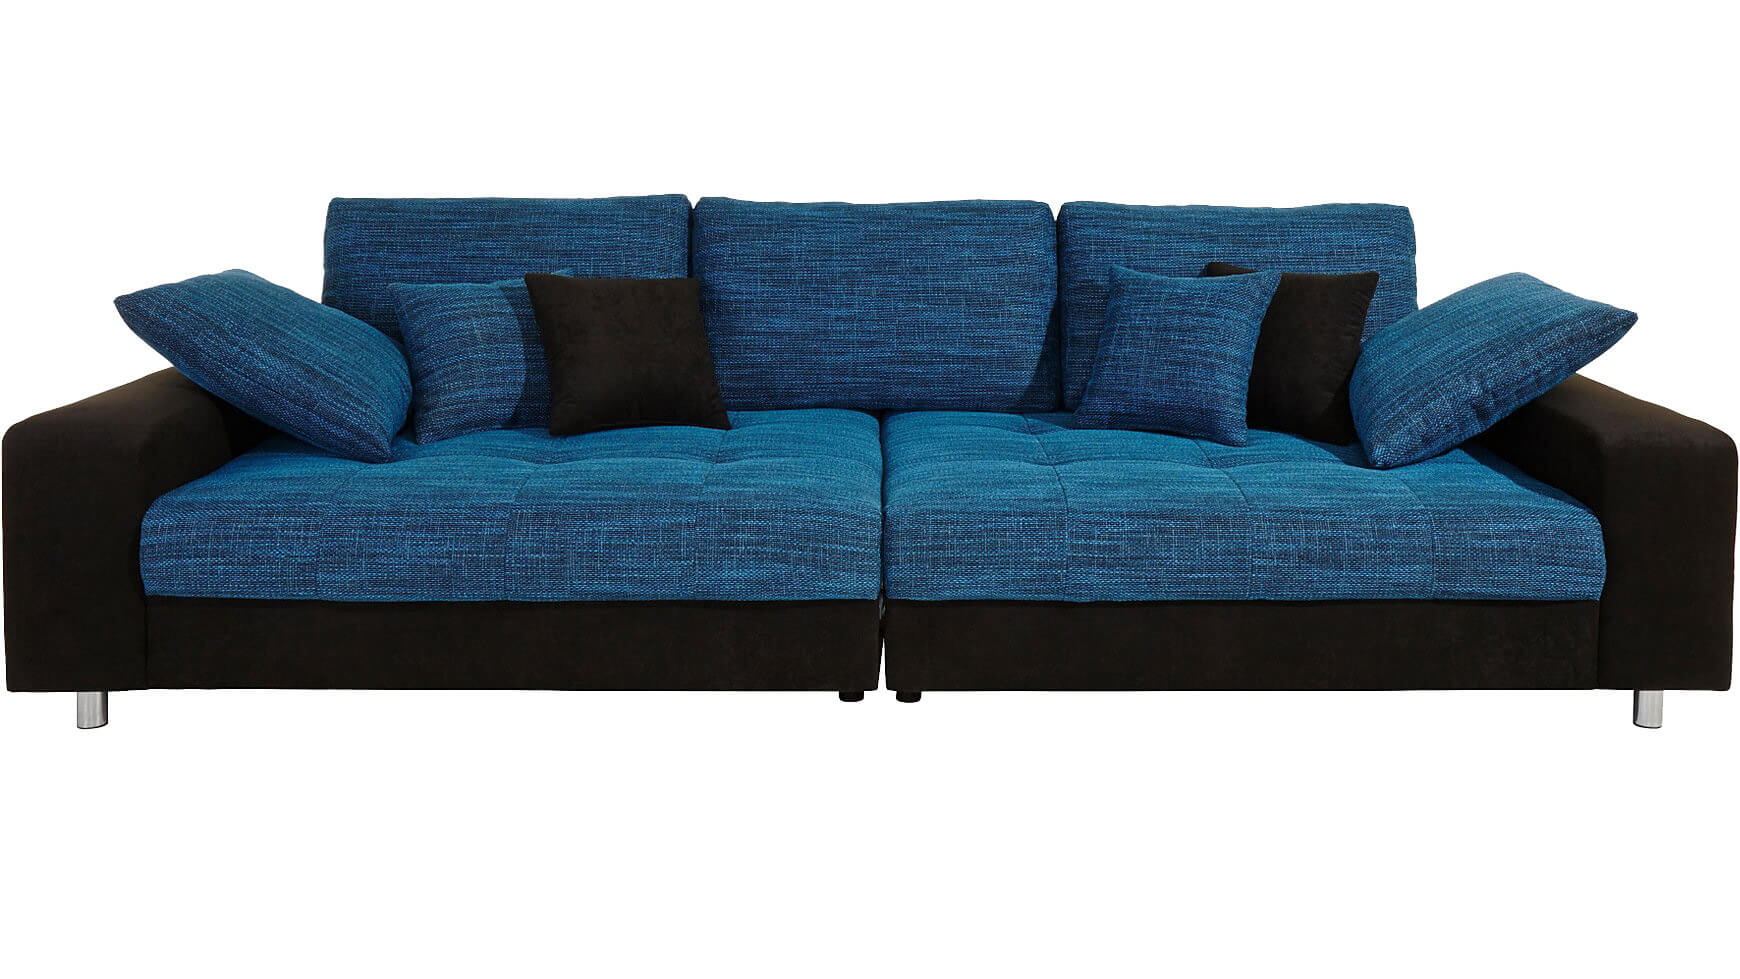 Full Size of Lange Sofaborde Sofakissen Langes Sofa Kaufen Lang Sofaer Gerd Xxl Couch Extragroe Sofas Bestellen Bei Cnouchde Mit Abnehmbaren Bezug Erpo Vitra Grau Weiß Big Sofa Langes Sofa